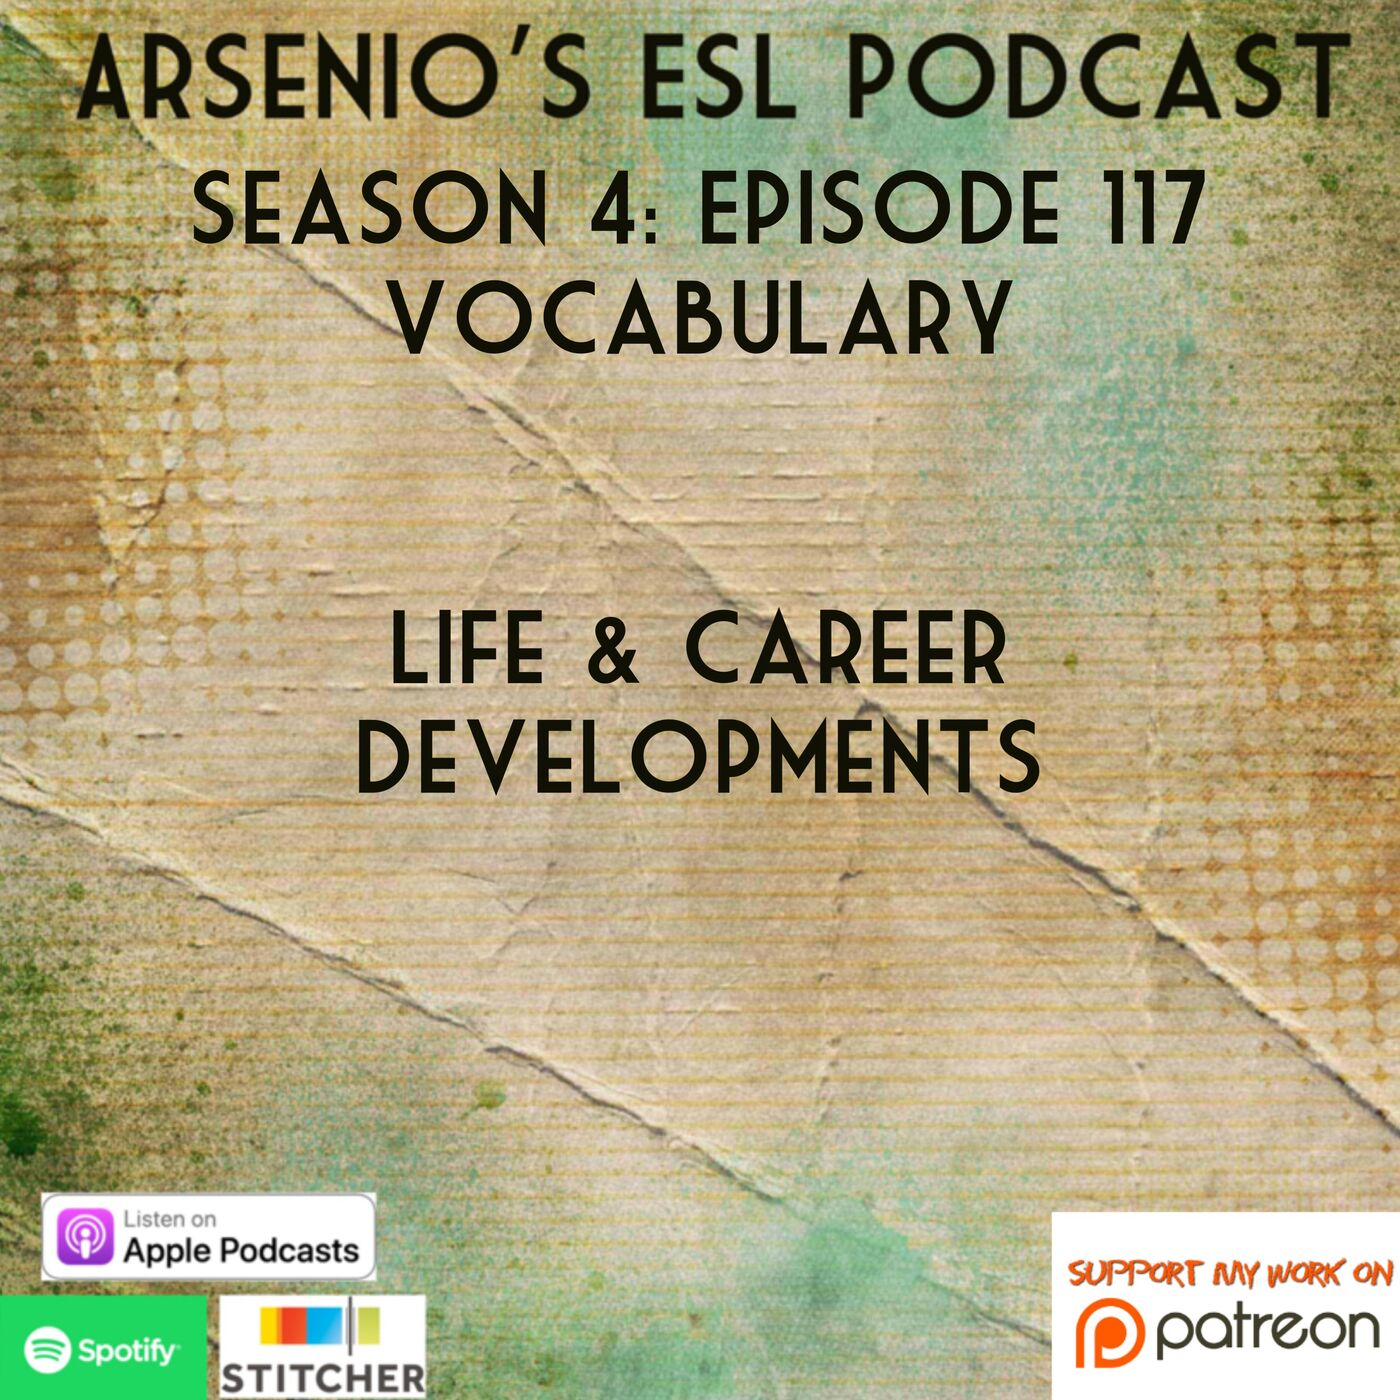 Arsenio's ESL Podcast: Season 4 - Episode 117 - Vocabulary - Life and Career Developments